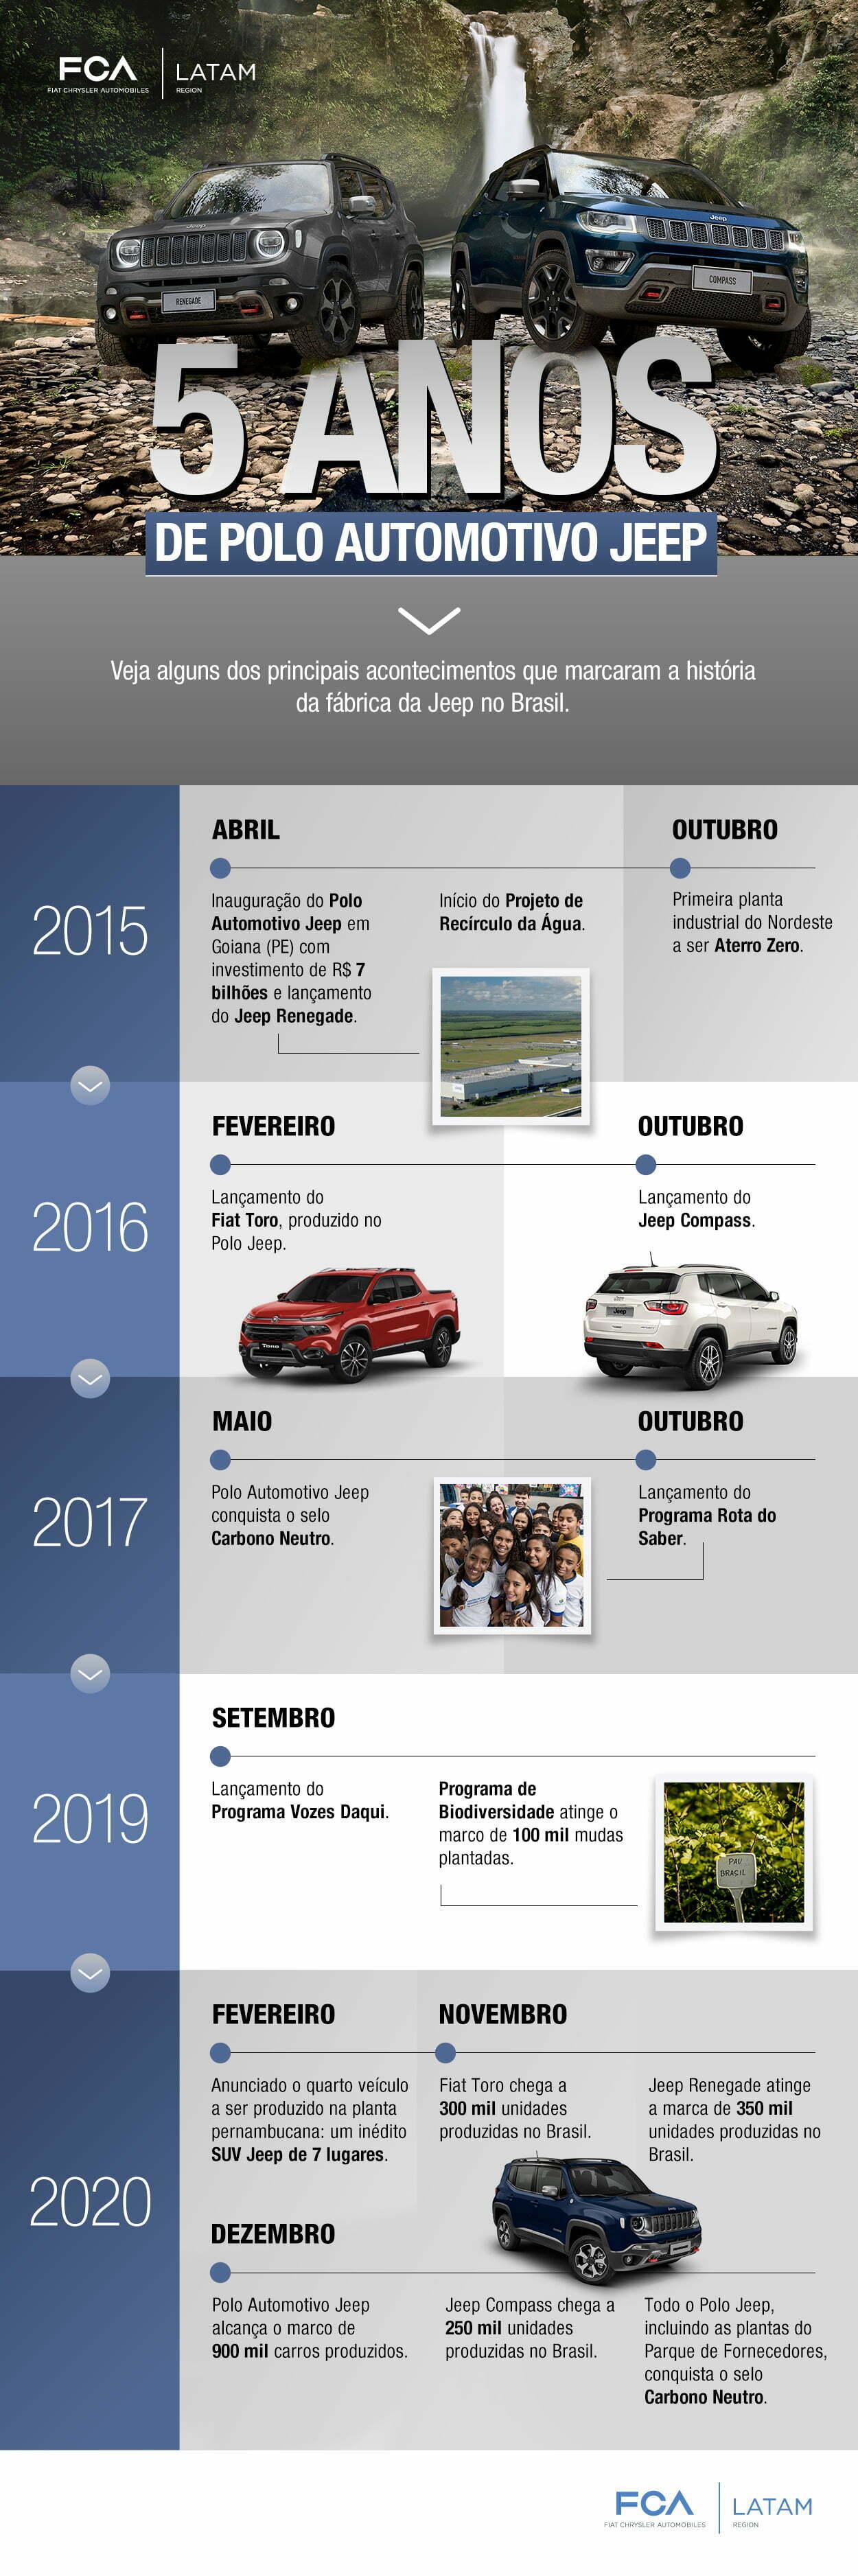 Infográfico 5 anos de Polo Automotivo Jeep